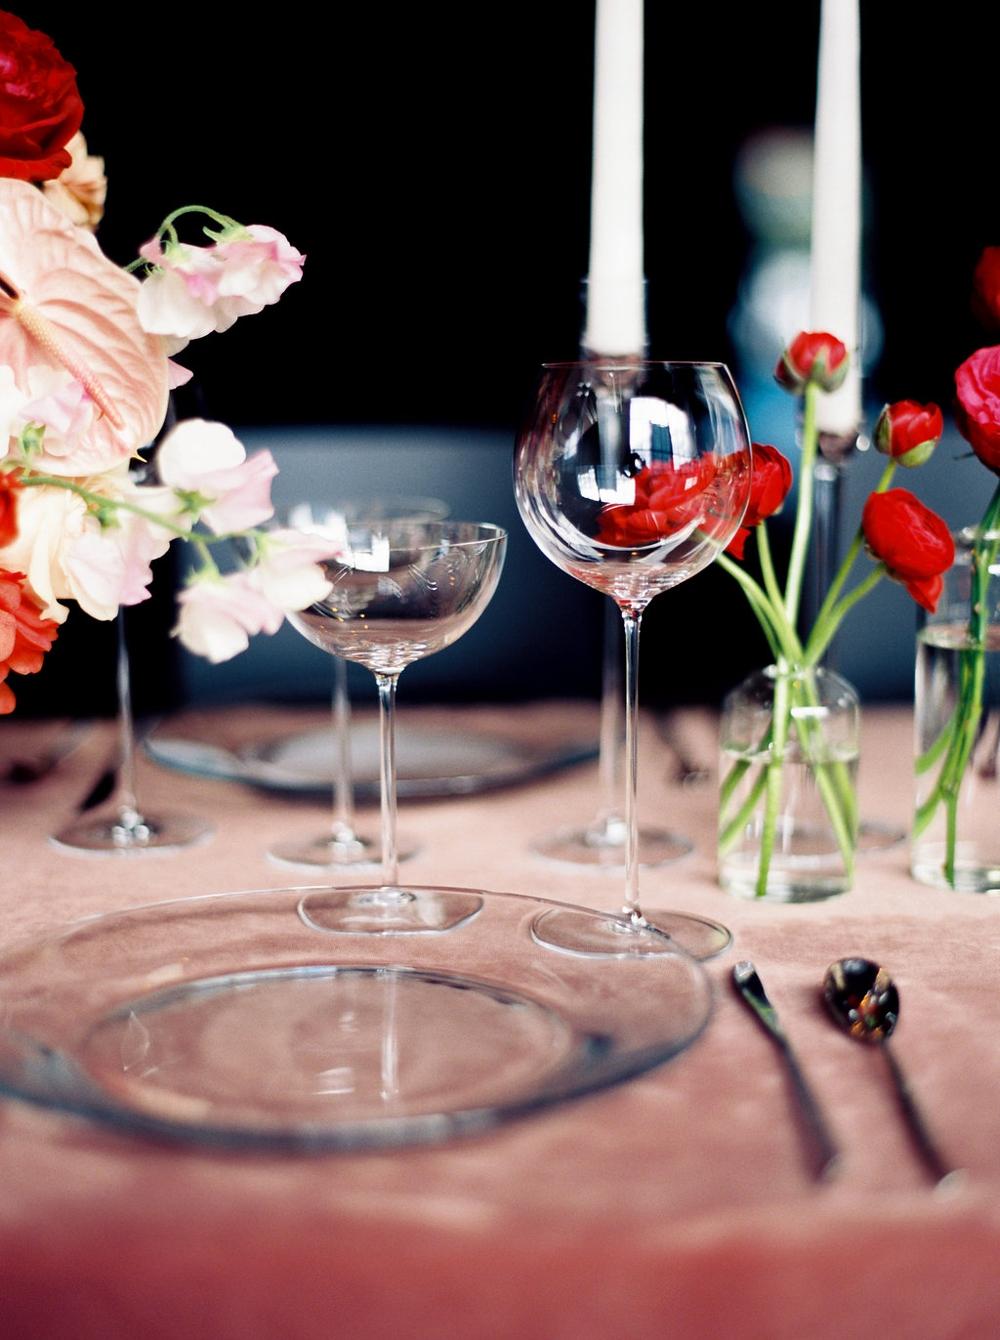 editorial-session-seattle-flower-stylist 7.jpg